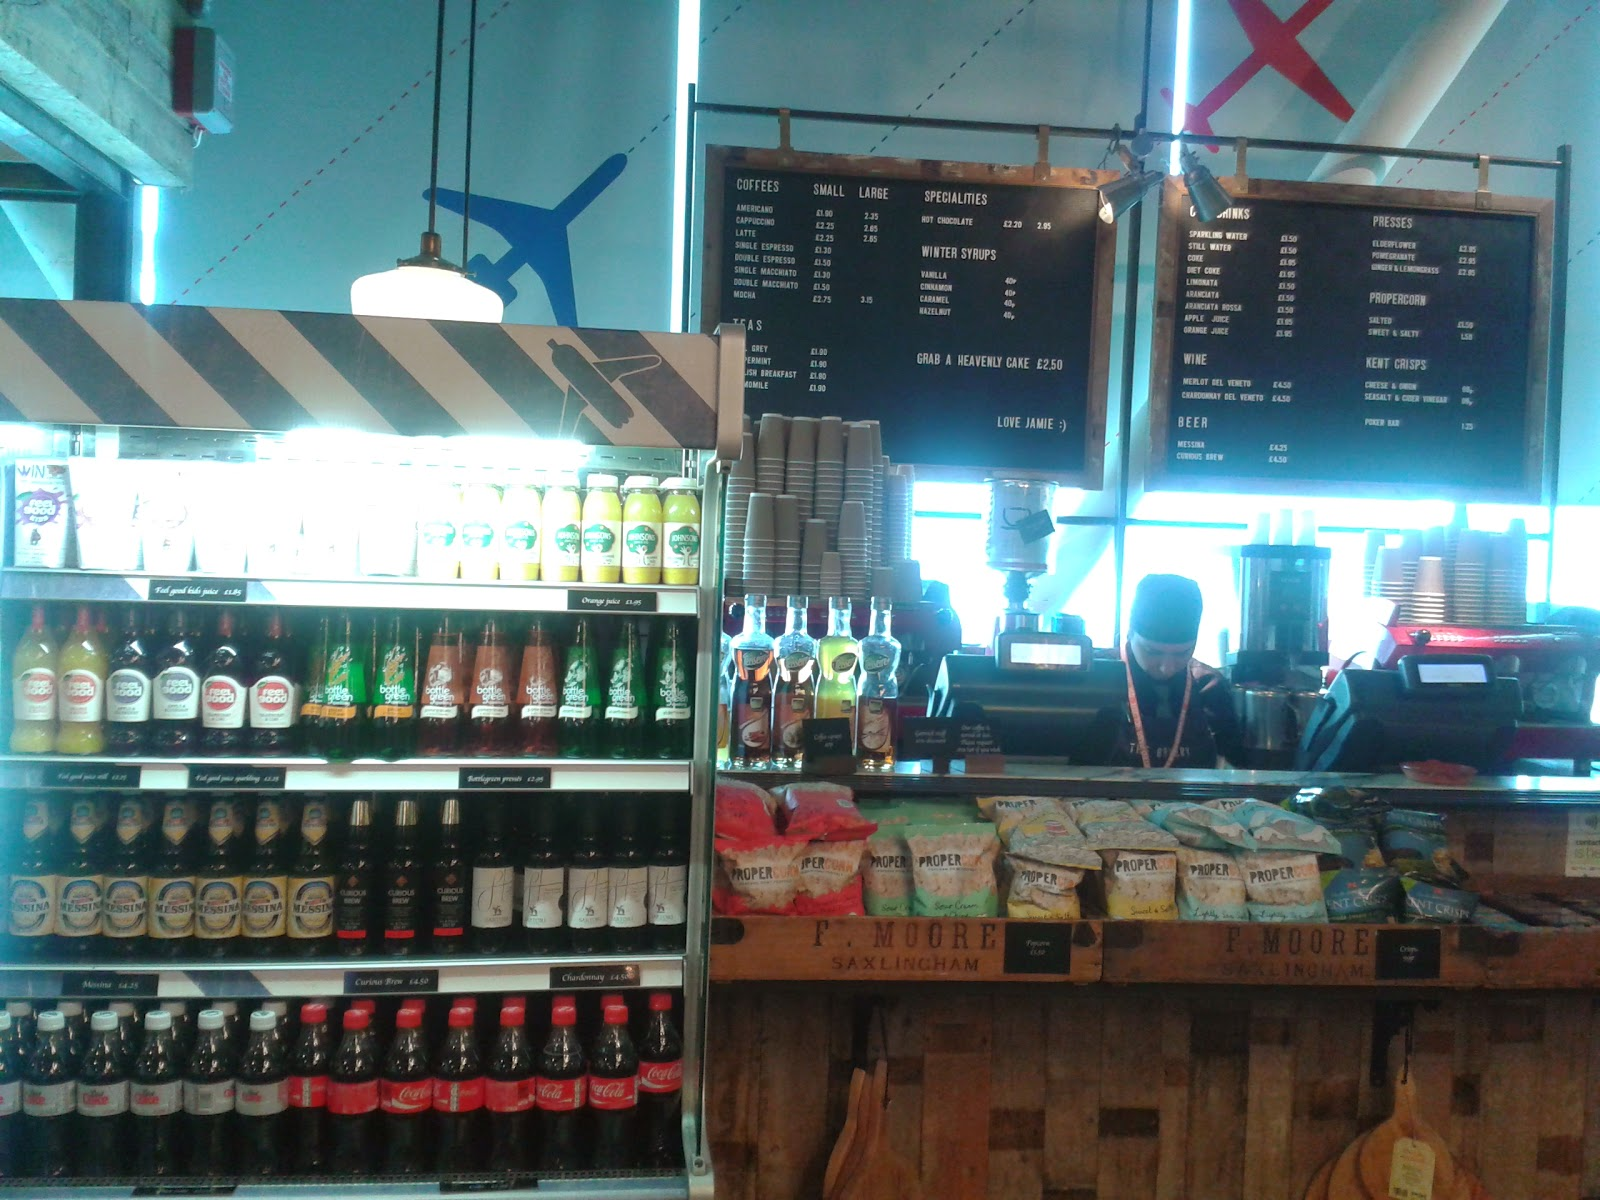 My Food Place Of The Week Jamies Italian Restaurant Bar Bakery